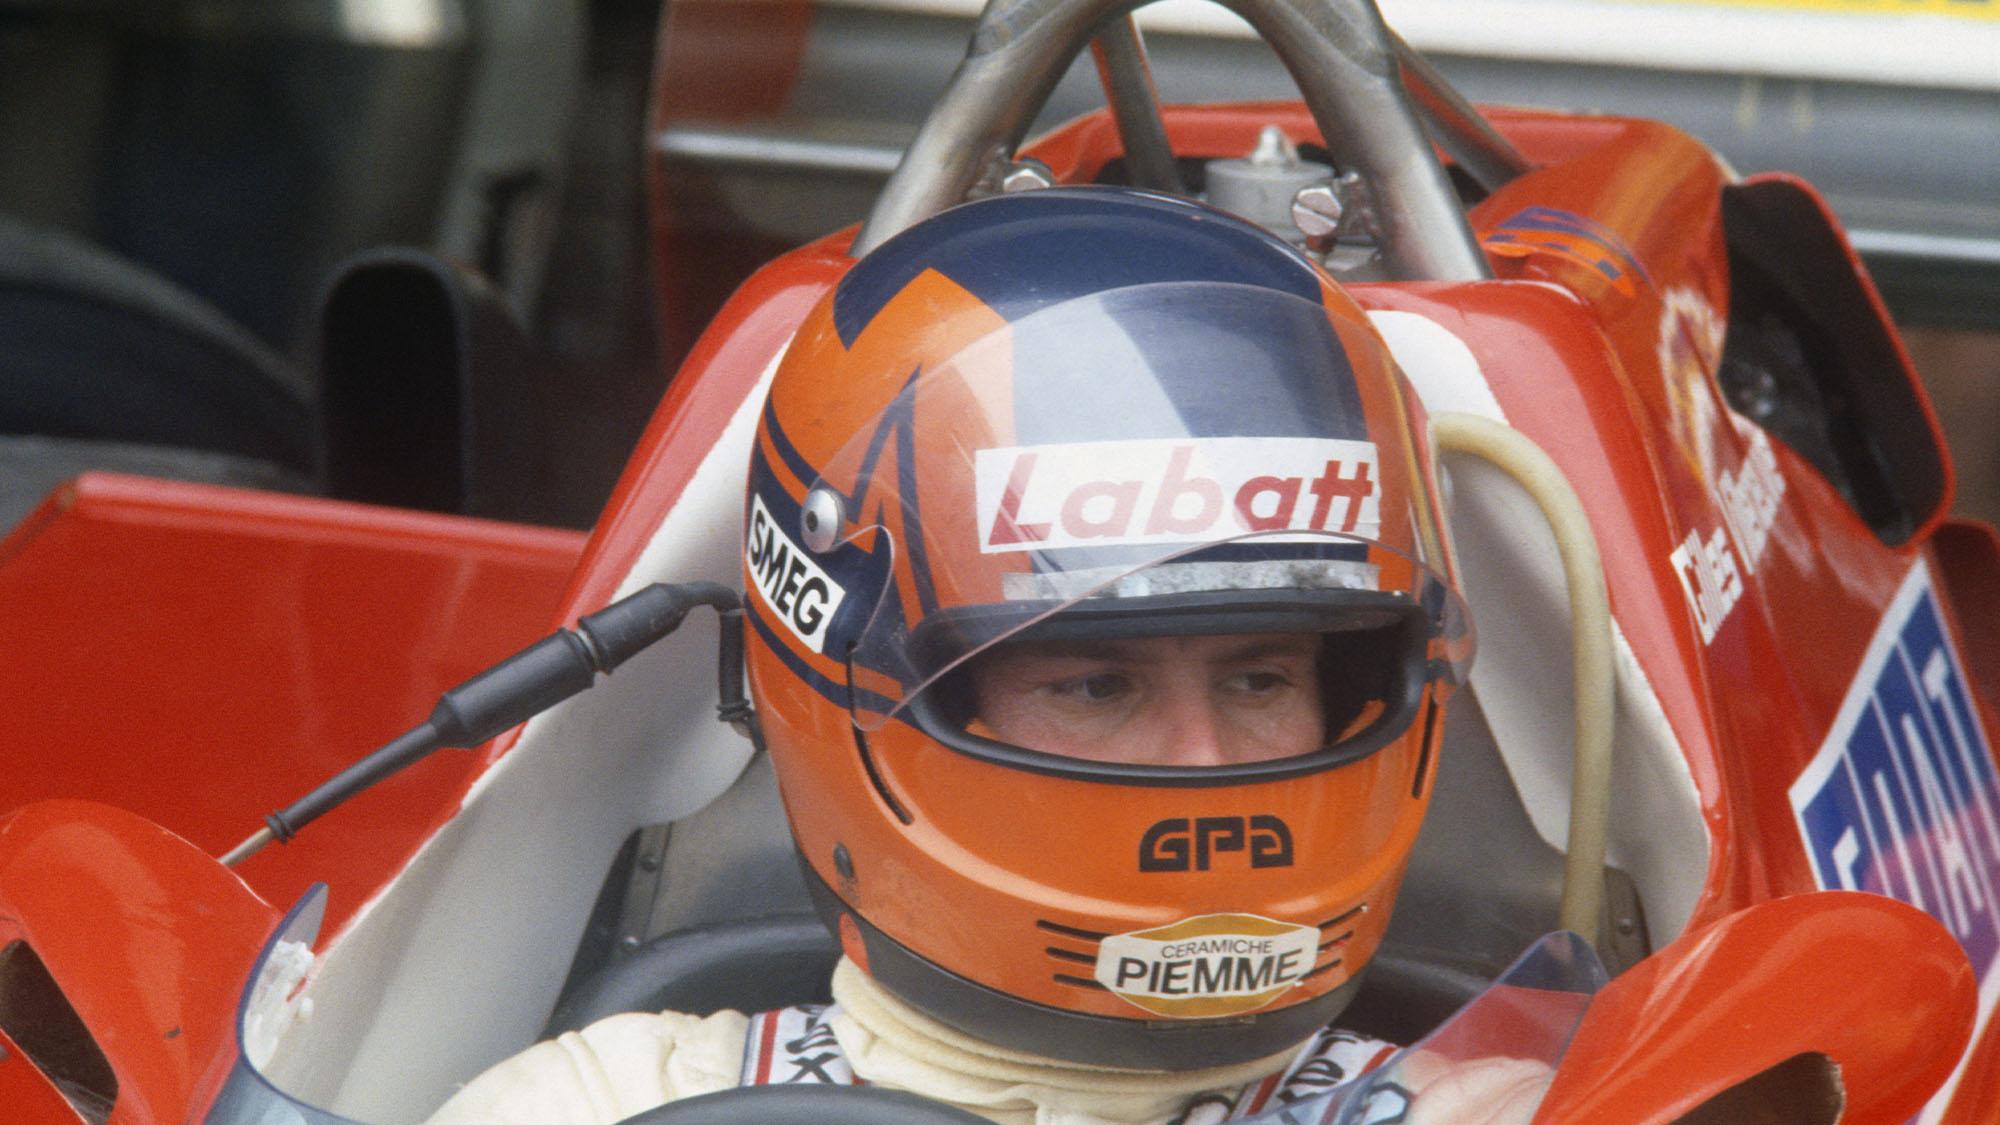 Gilles Villeneuve (Ferrari) in the pits with his helmet on before the 1981 Brazilian Grand Prix at the Jacarepagua circuit outside Rio de Janeiro. Photo: Grand Prix Photo